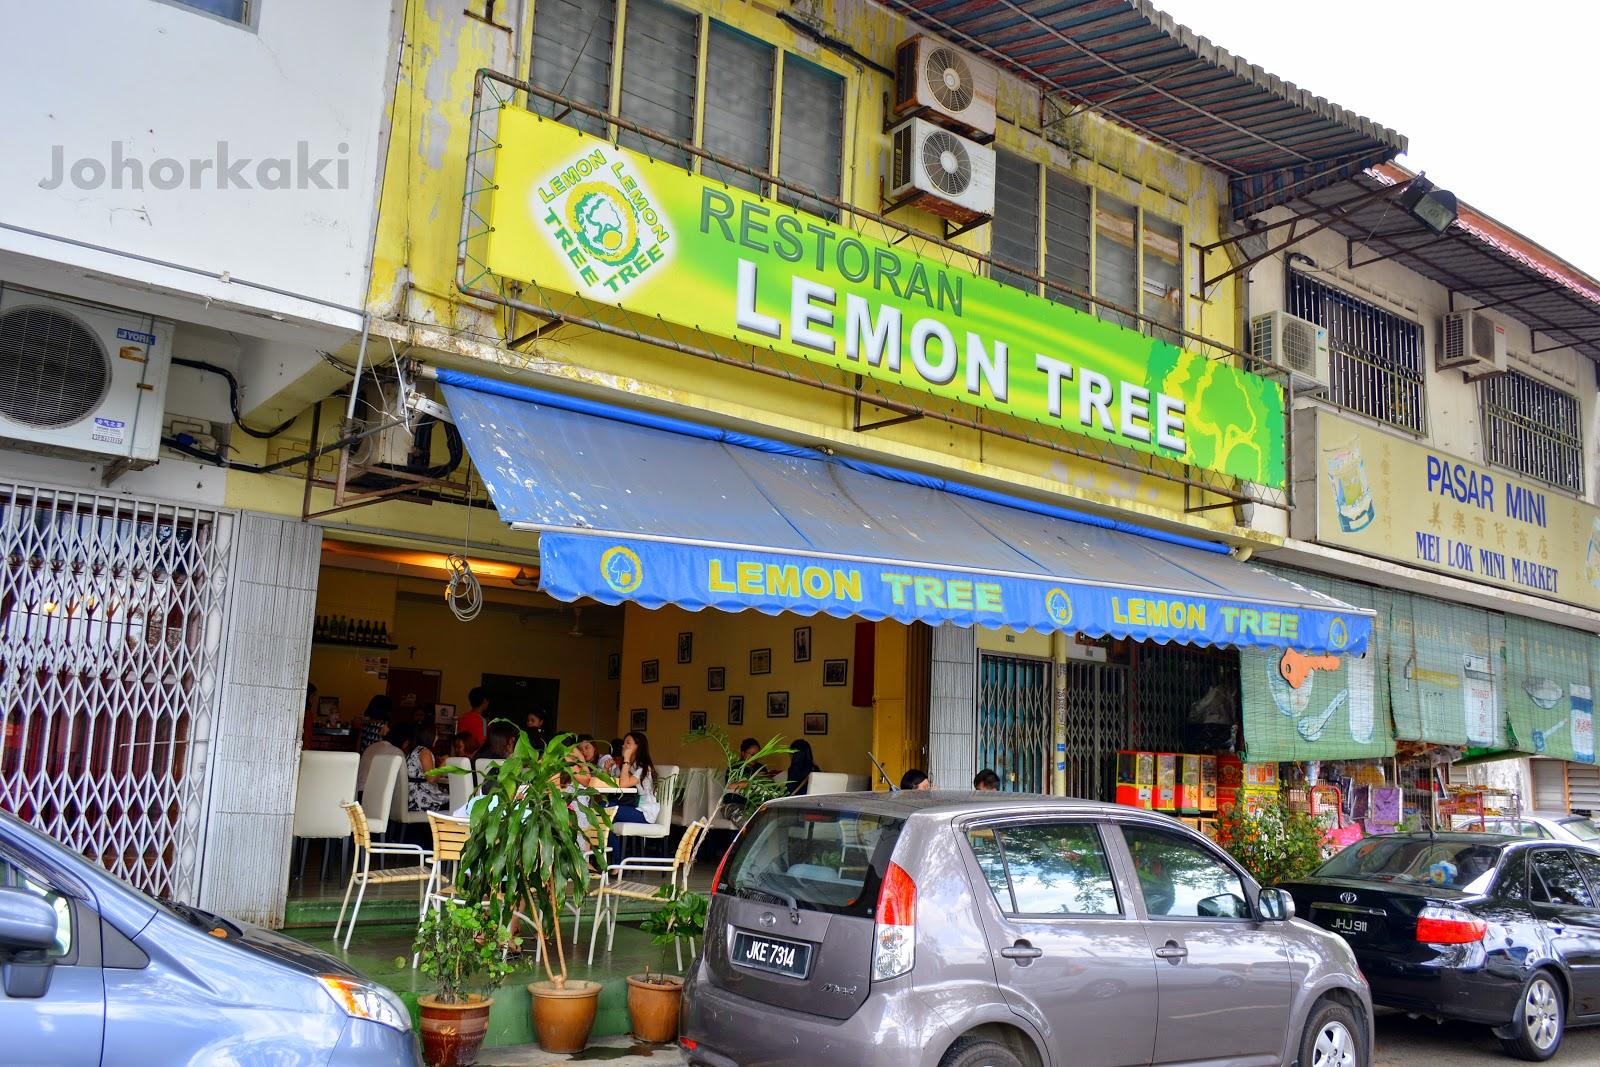 Lemon tree restaurant in johor bahru taman melodies